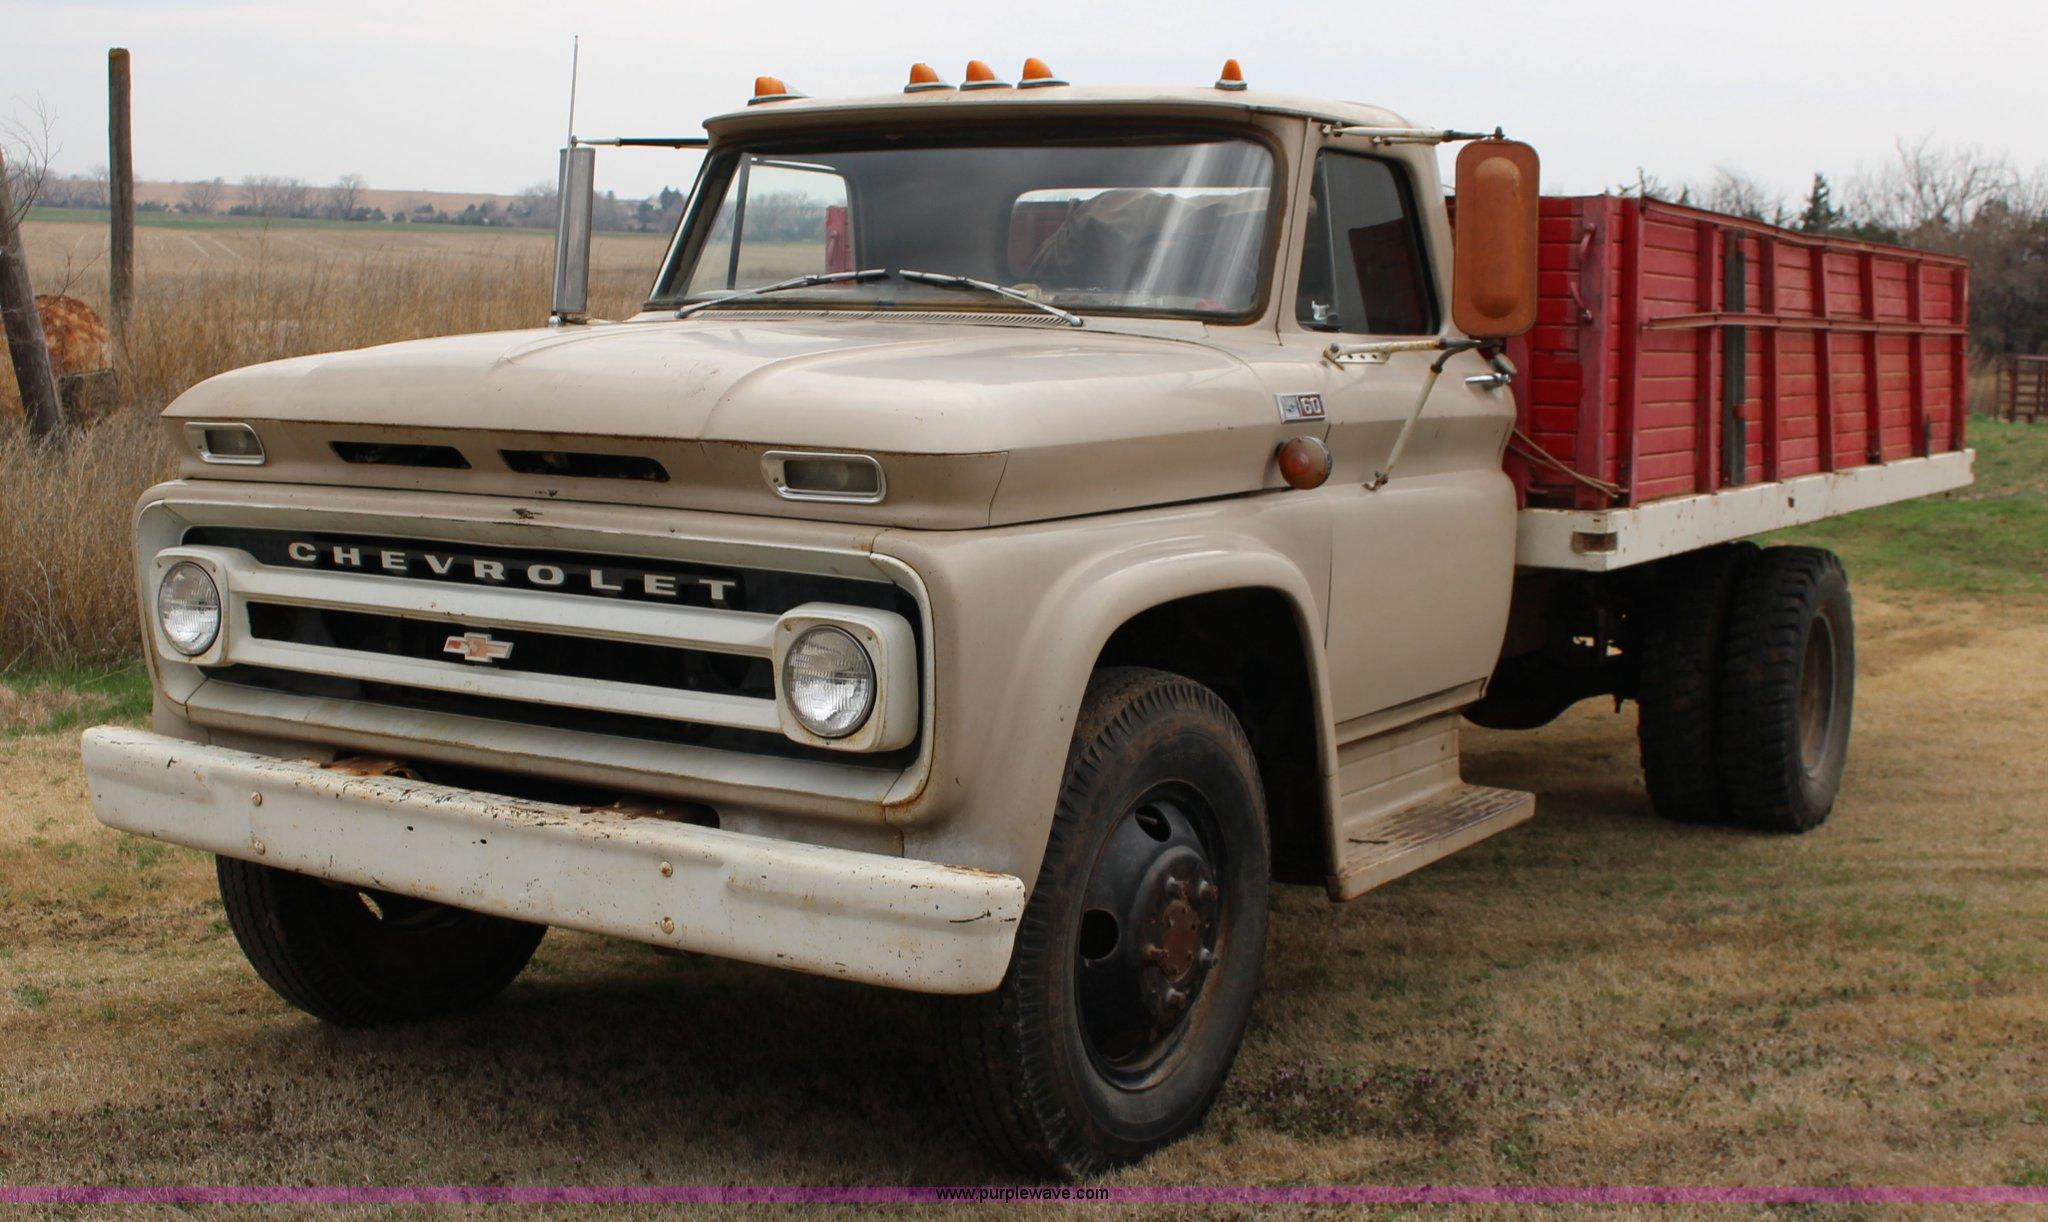 Grain Trucks For Sale >> 1965 Chevrolet C60 Grain Truck Item F7609 Sold April 29